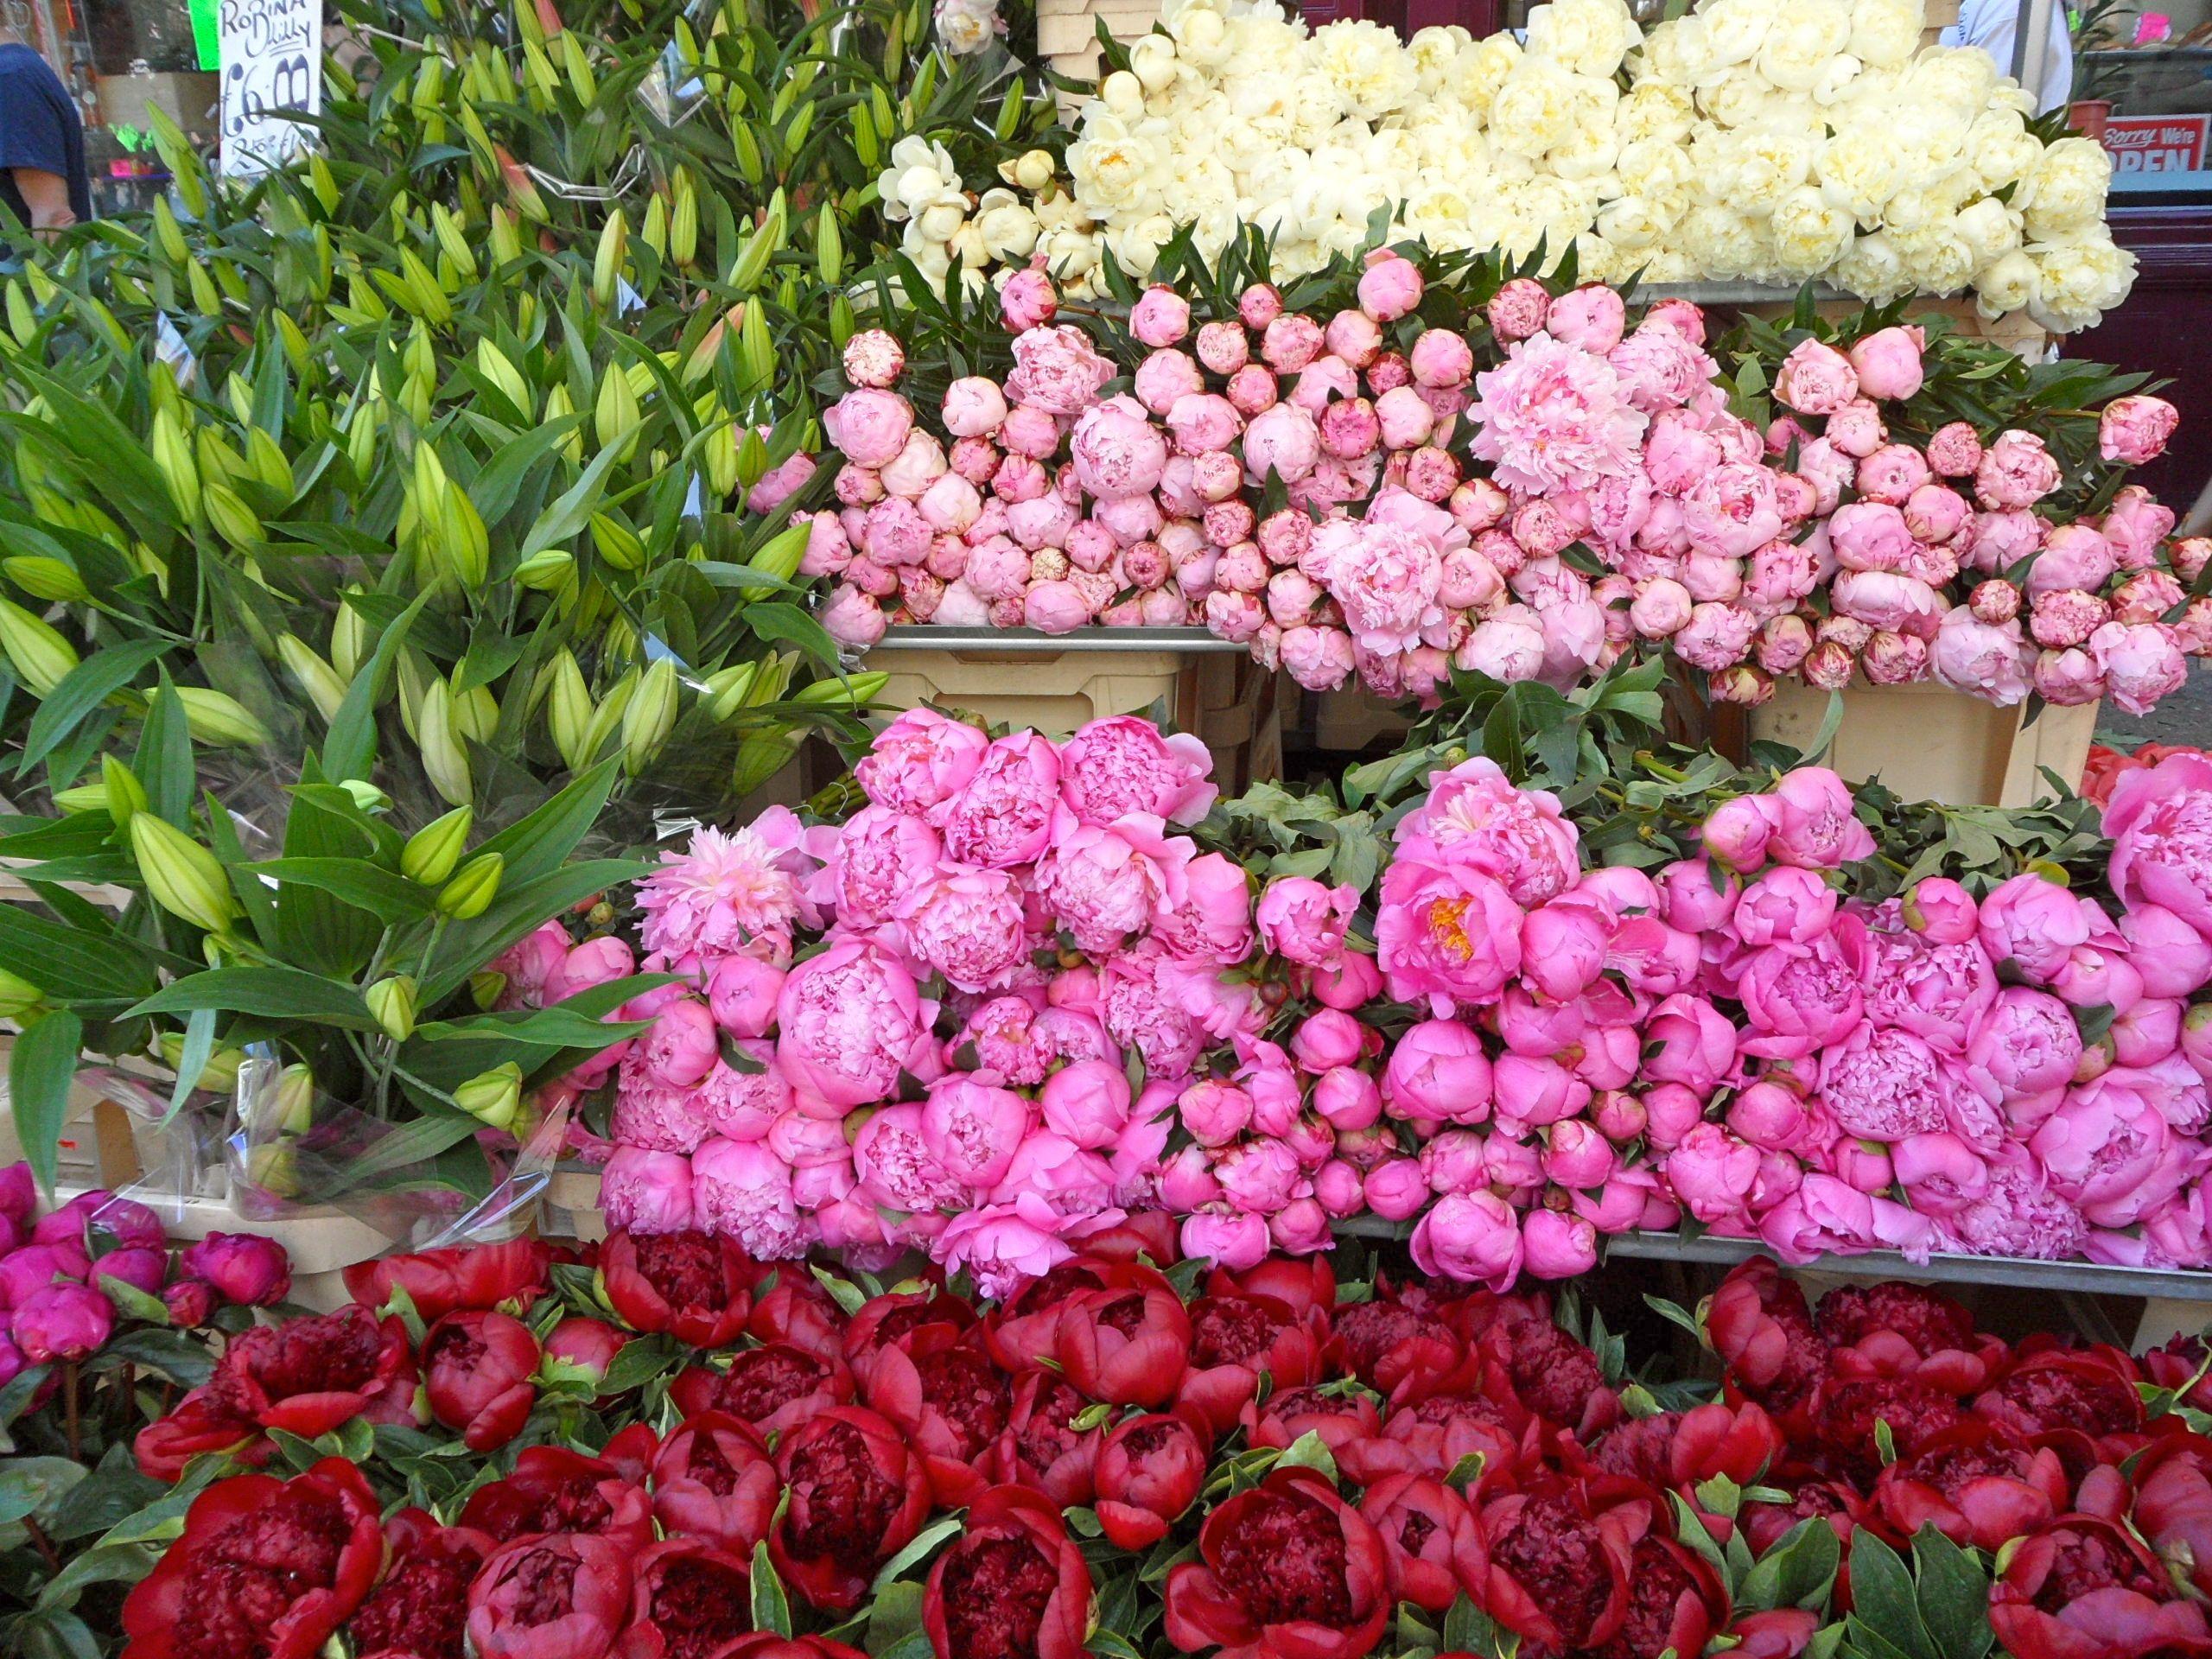 Columbia Flower Market London Flower Market Flower Boutique Flower Garlands